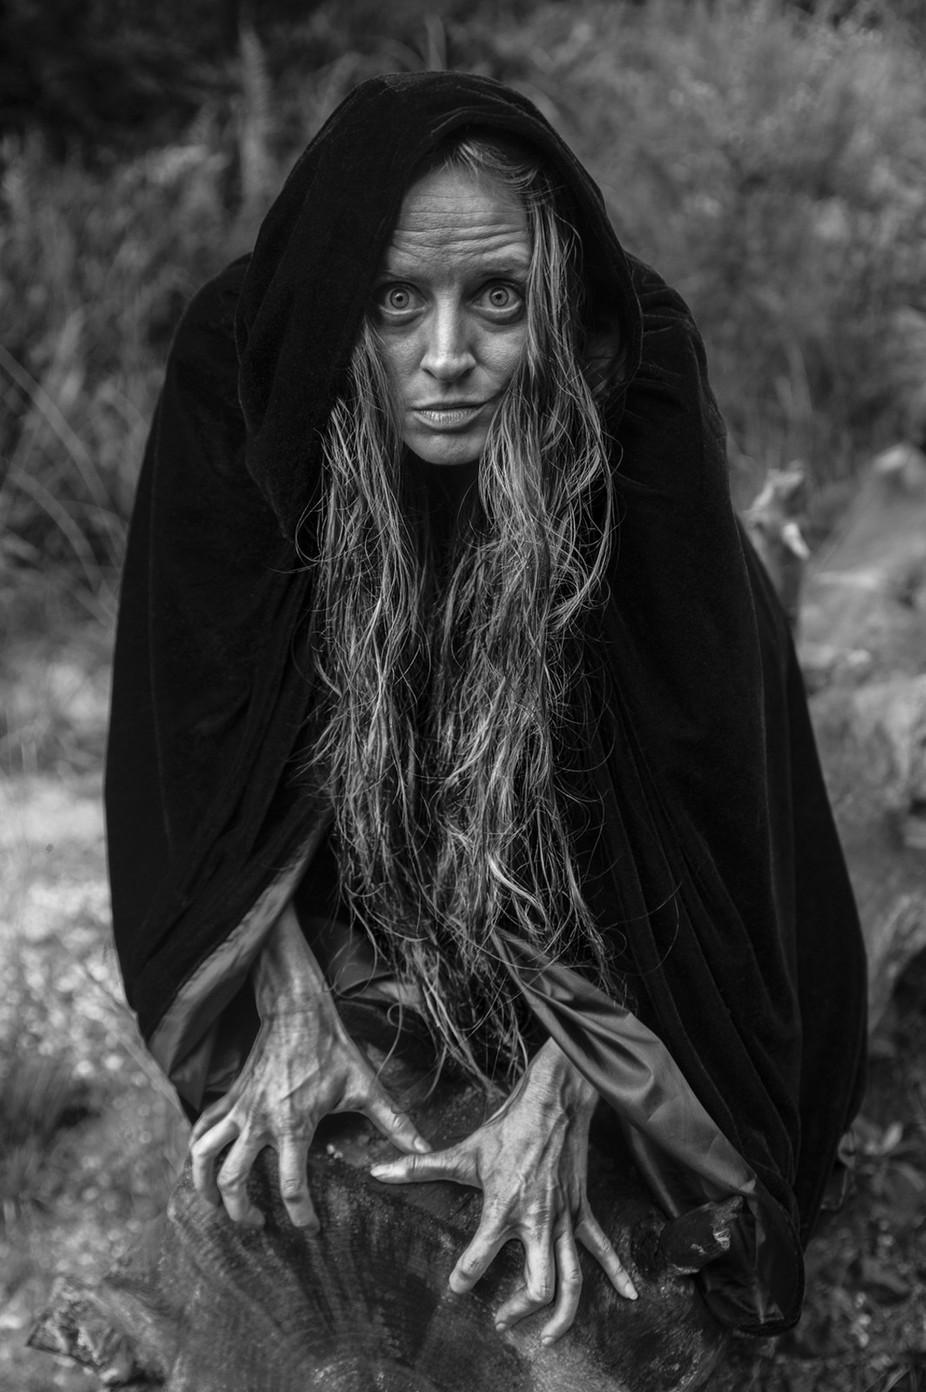 The Crone by GlenMorgan - Dark Portraits Photo Contest